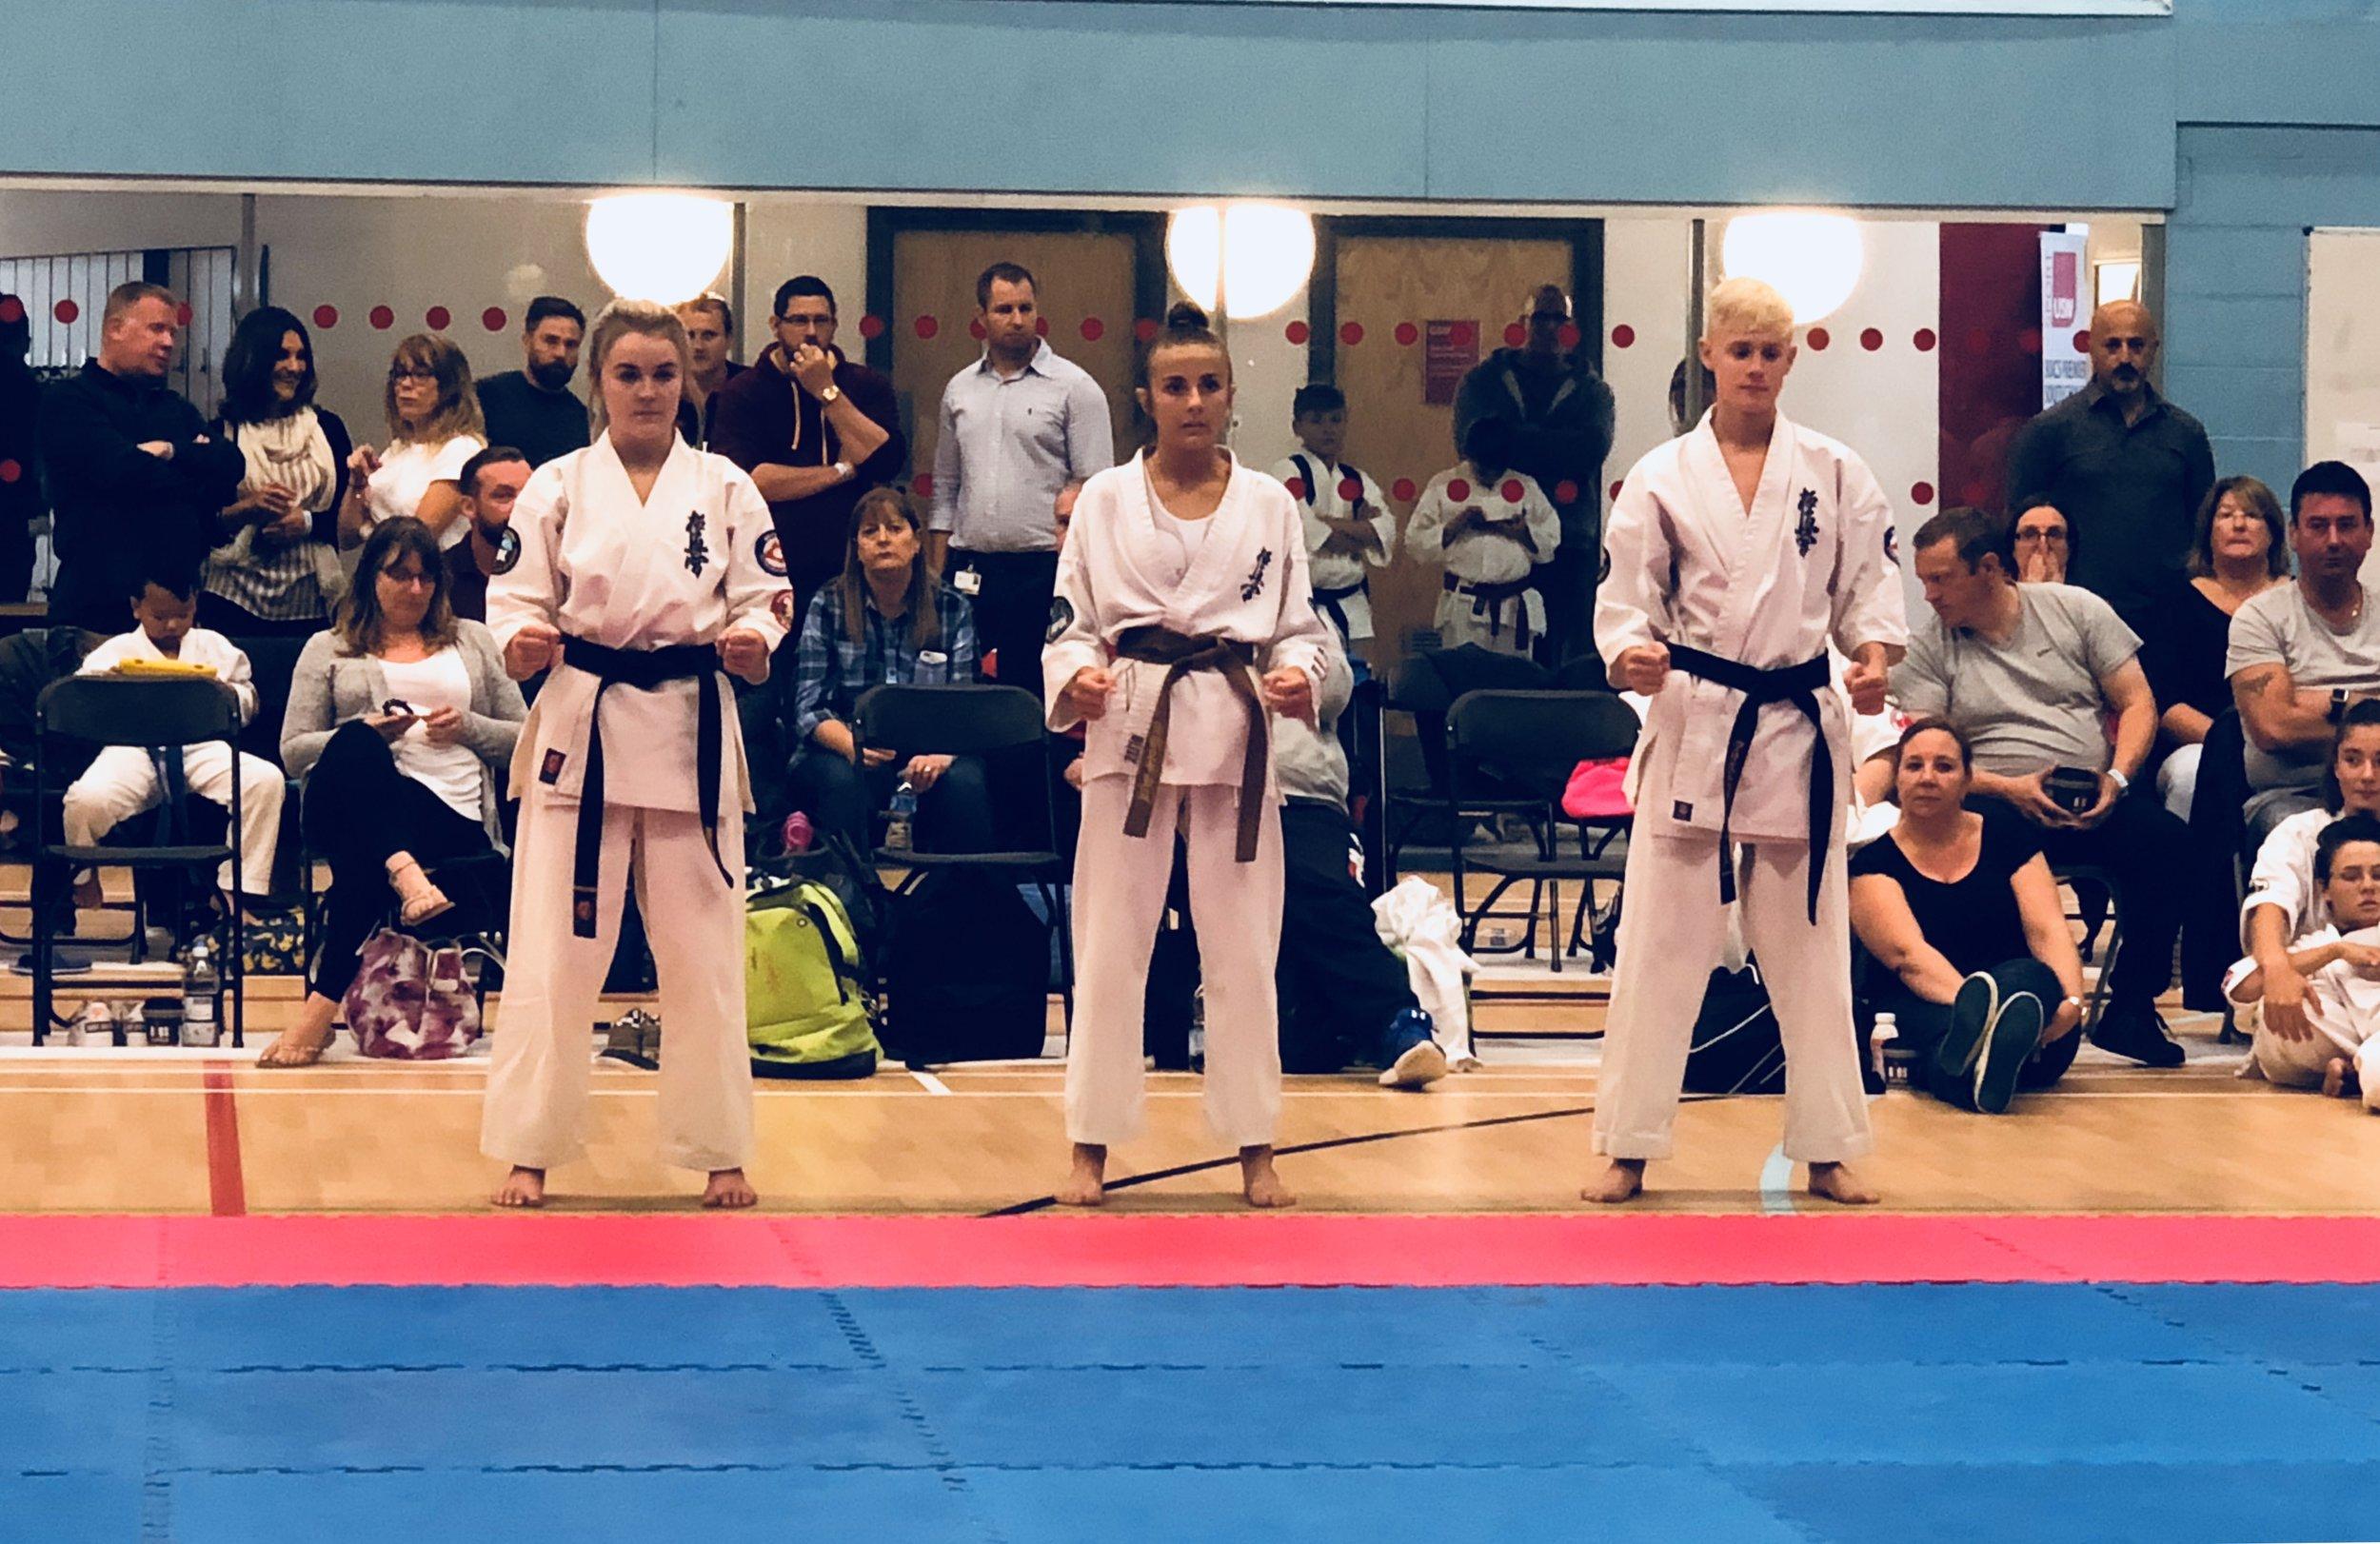 High Grade Kata finalists (L-R): Mia Morgan BKK Wales (2nd place), Chloe Slocombe BKK England (3rd place), Luke Davies BKK Wales (1st place)